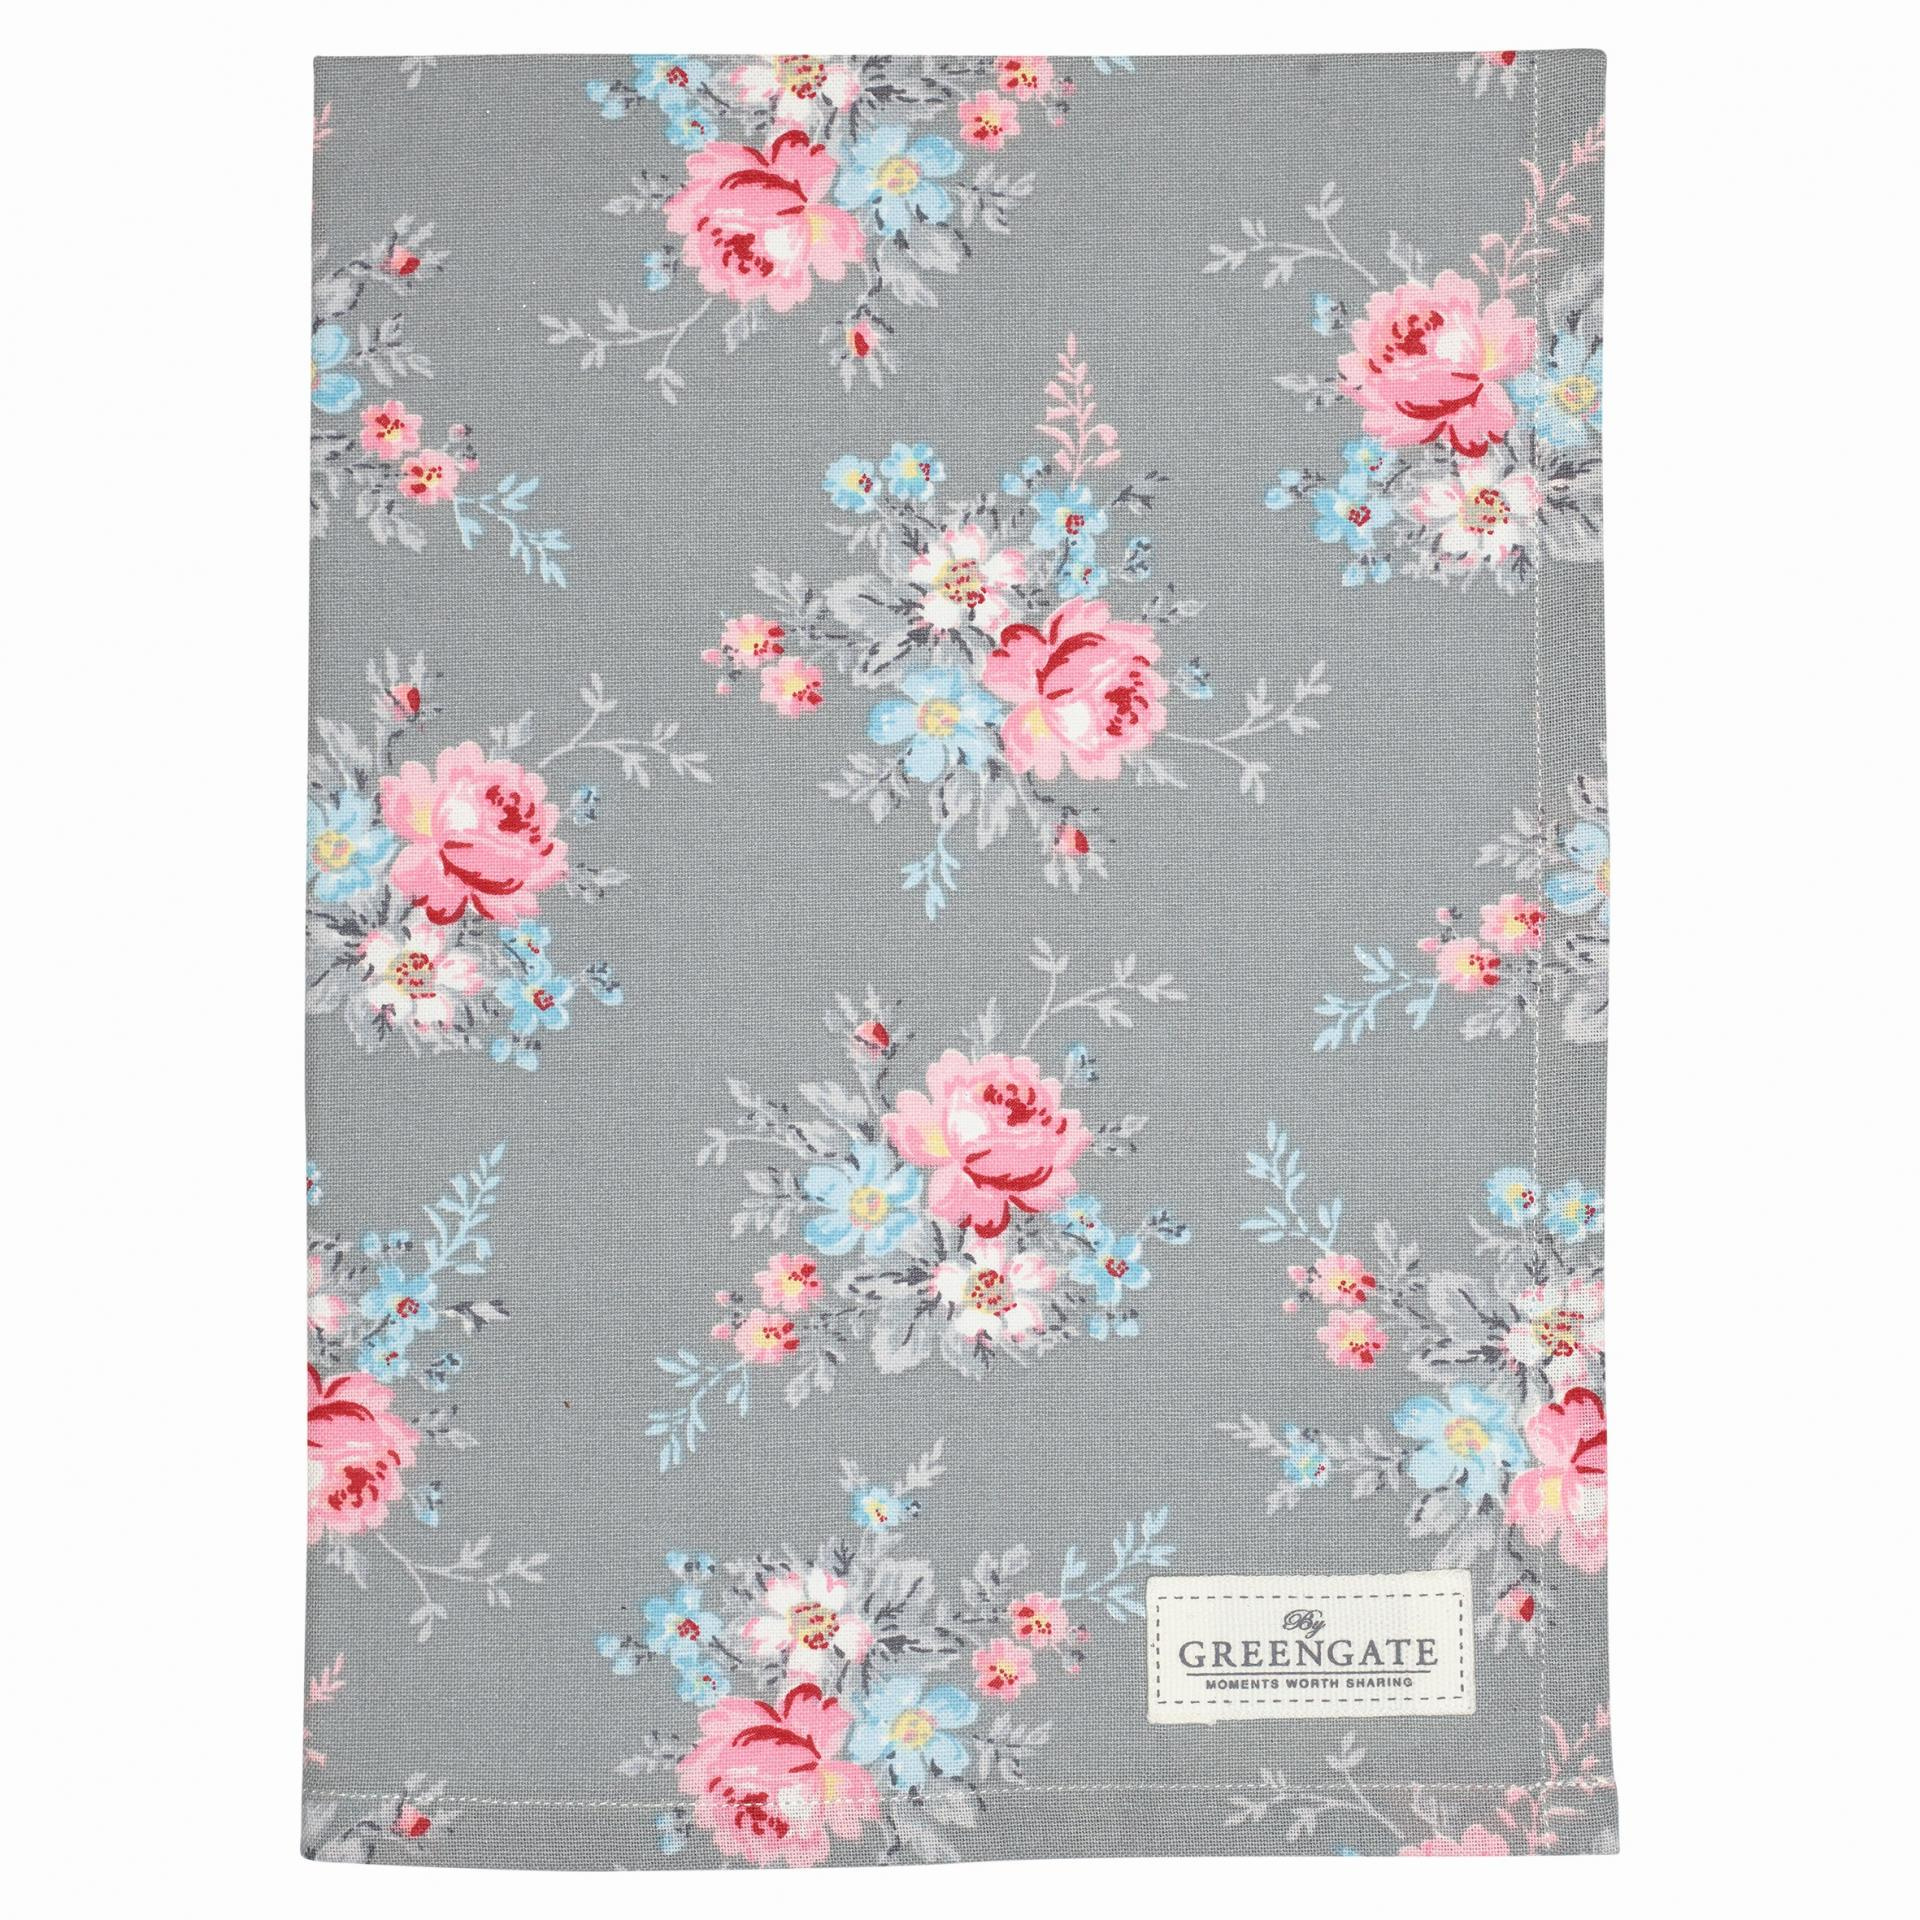 GREEN GATE Bavlněná utěrka Marie pale grey, růžová barva, šedá barva, bílá barva, textil